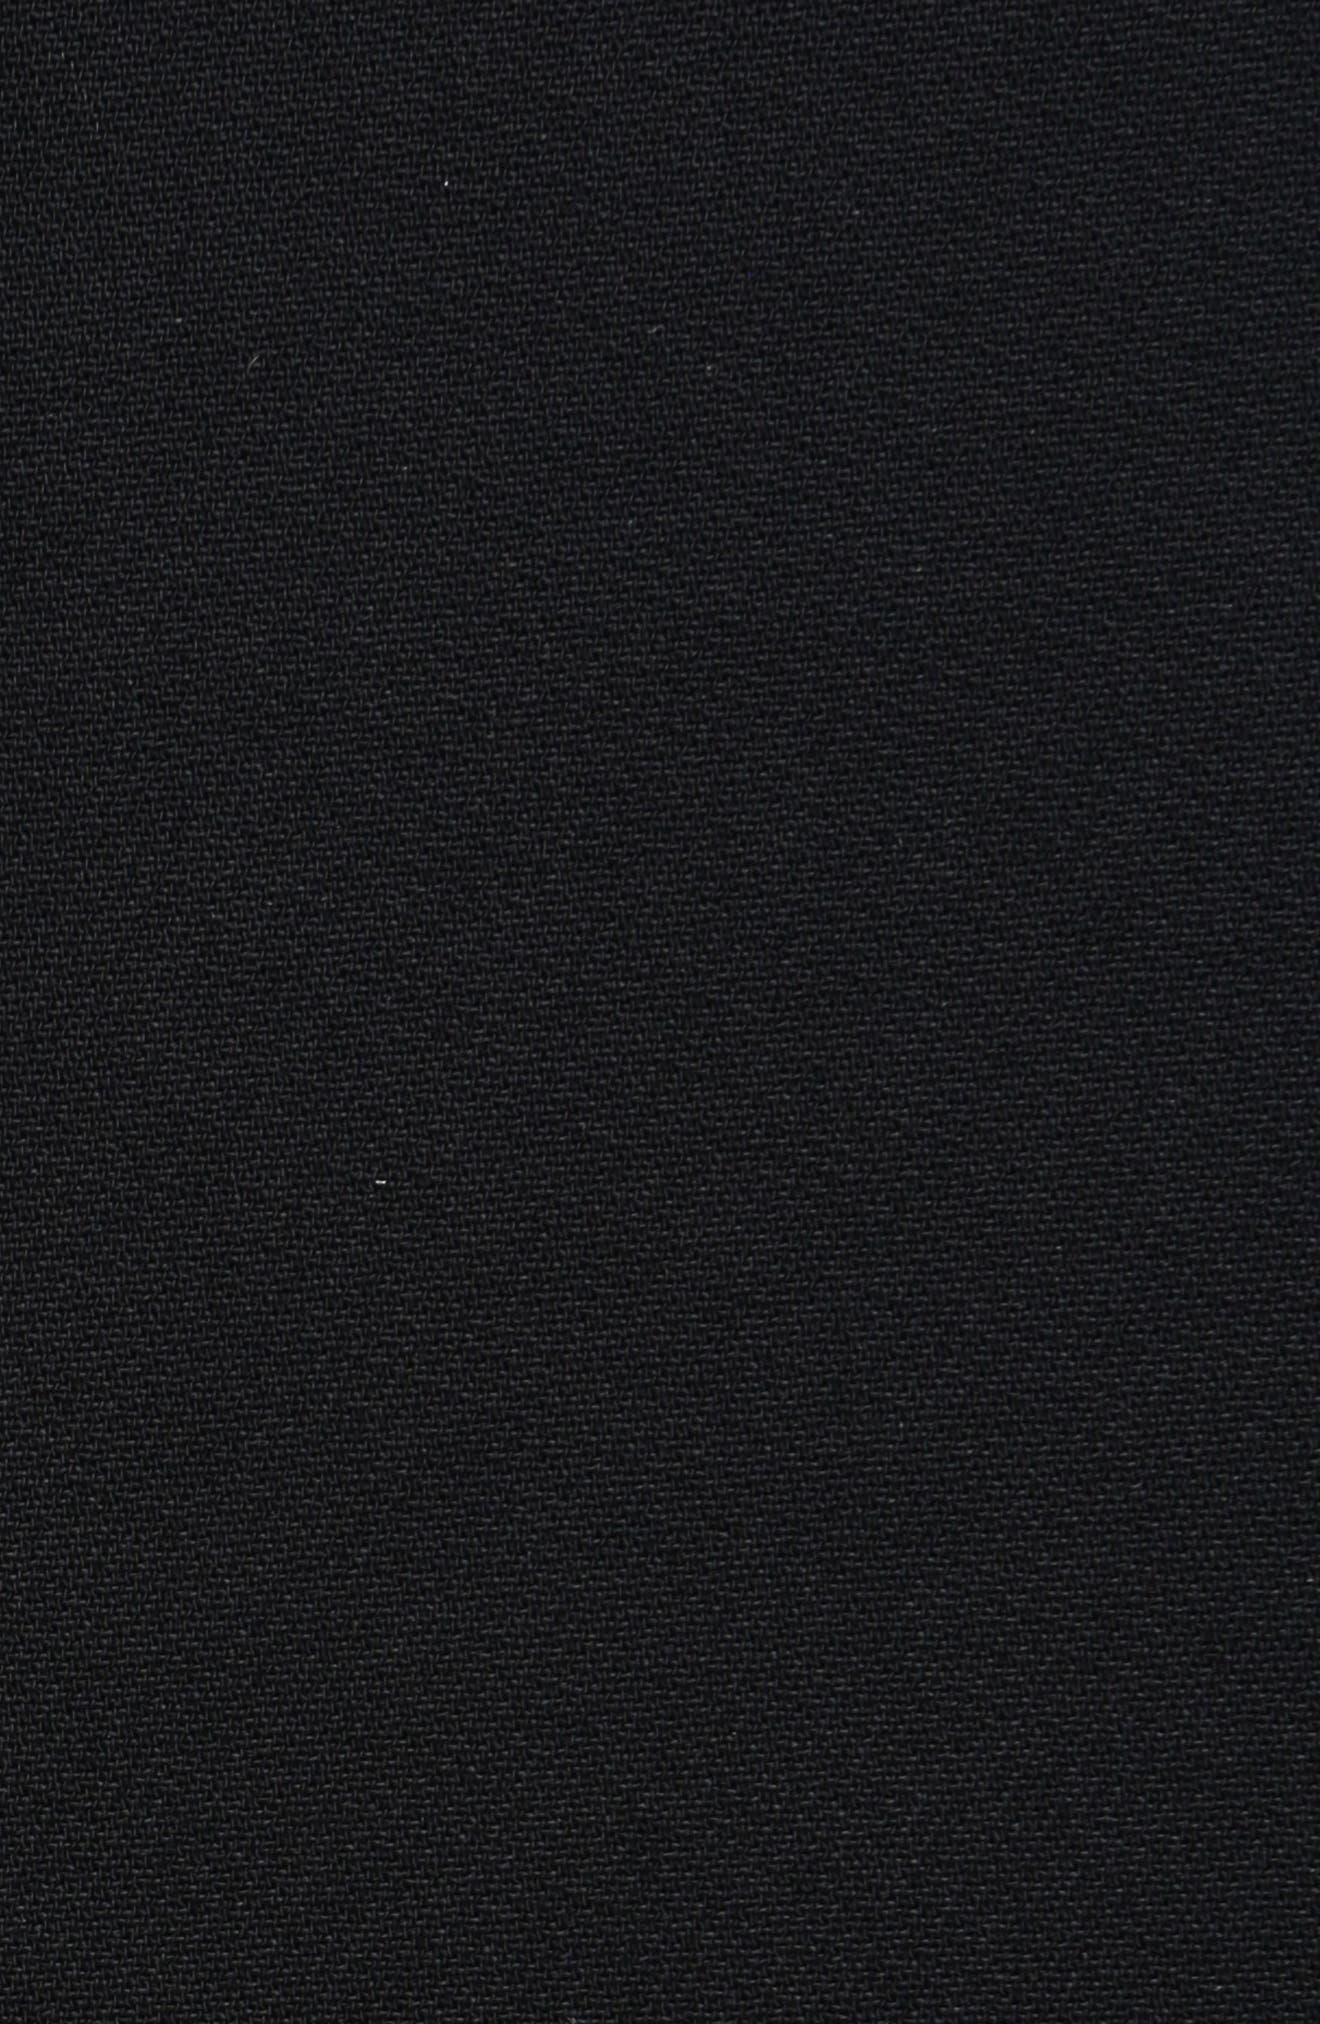 Lace Trim Stretch Cady Asymmetrical Dress,                             Alternate thumbnail 5, color,                             001